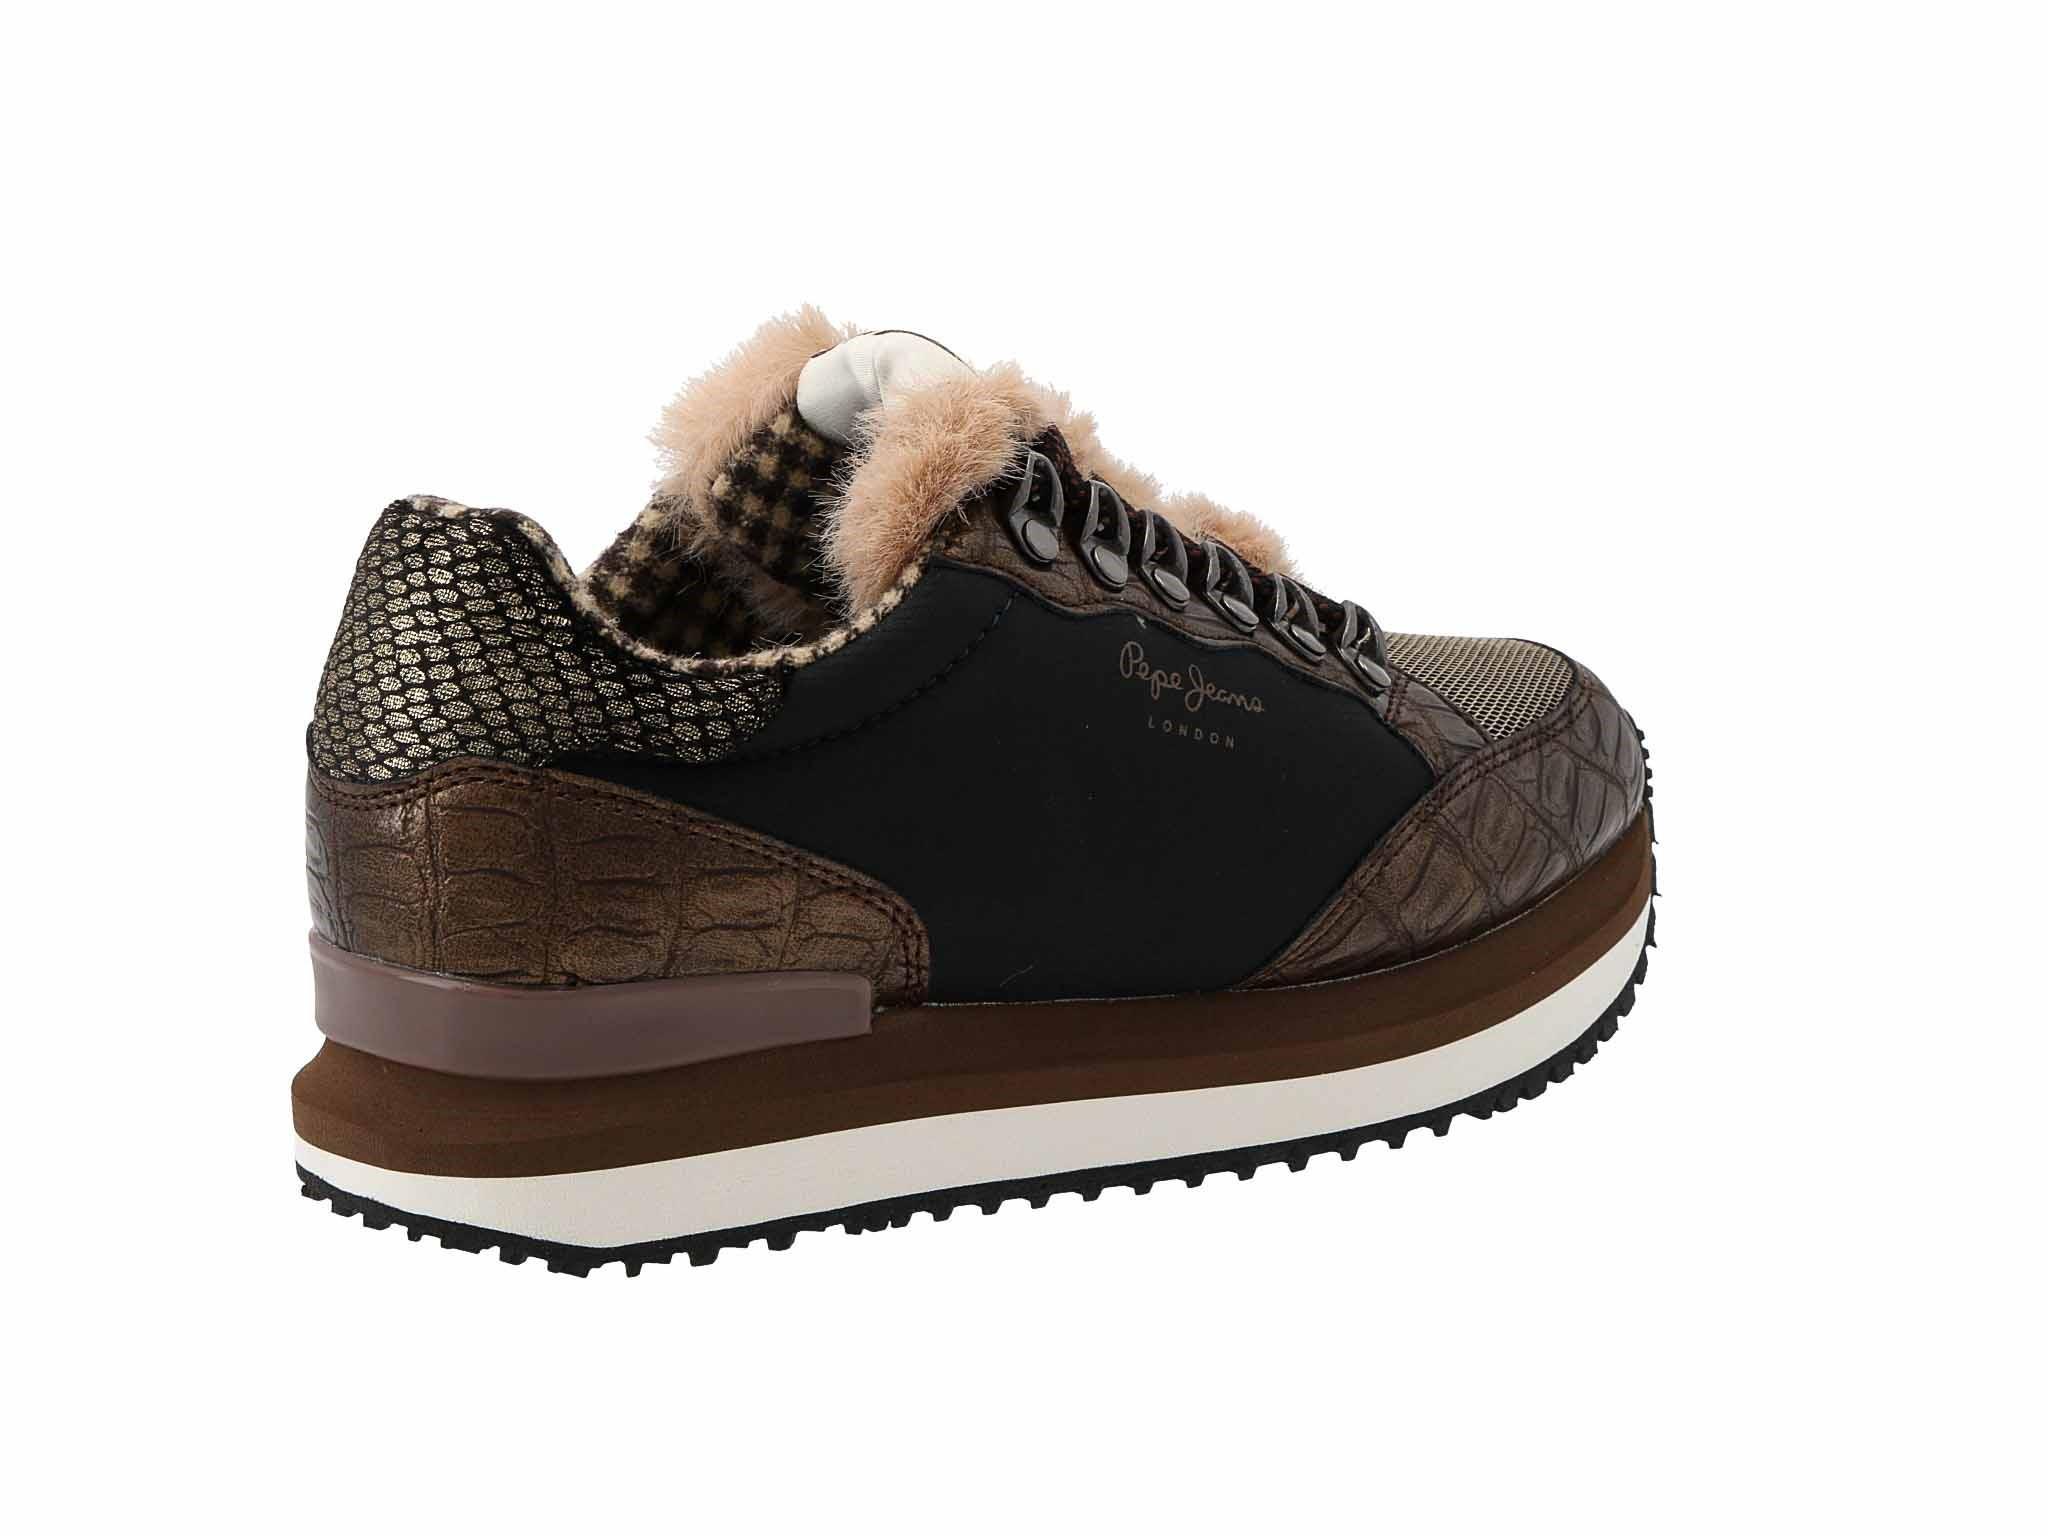 Sportcipő PEPE JEANS Zion Fur PLS30905 Biscuit 850